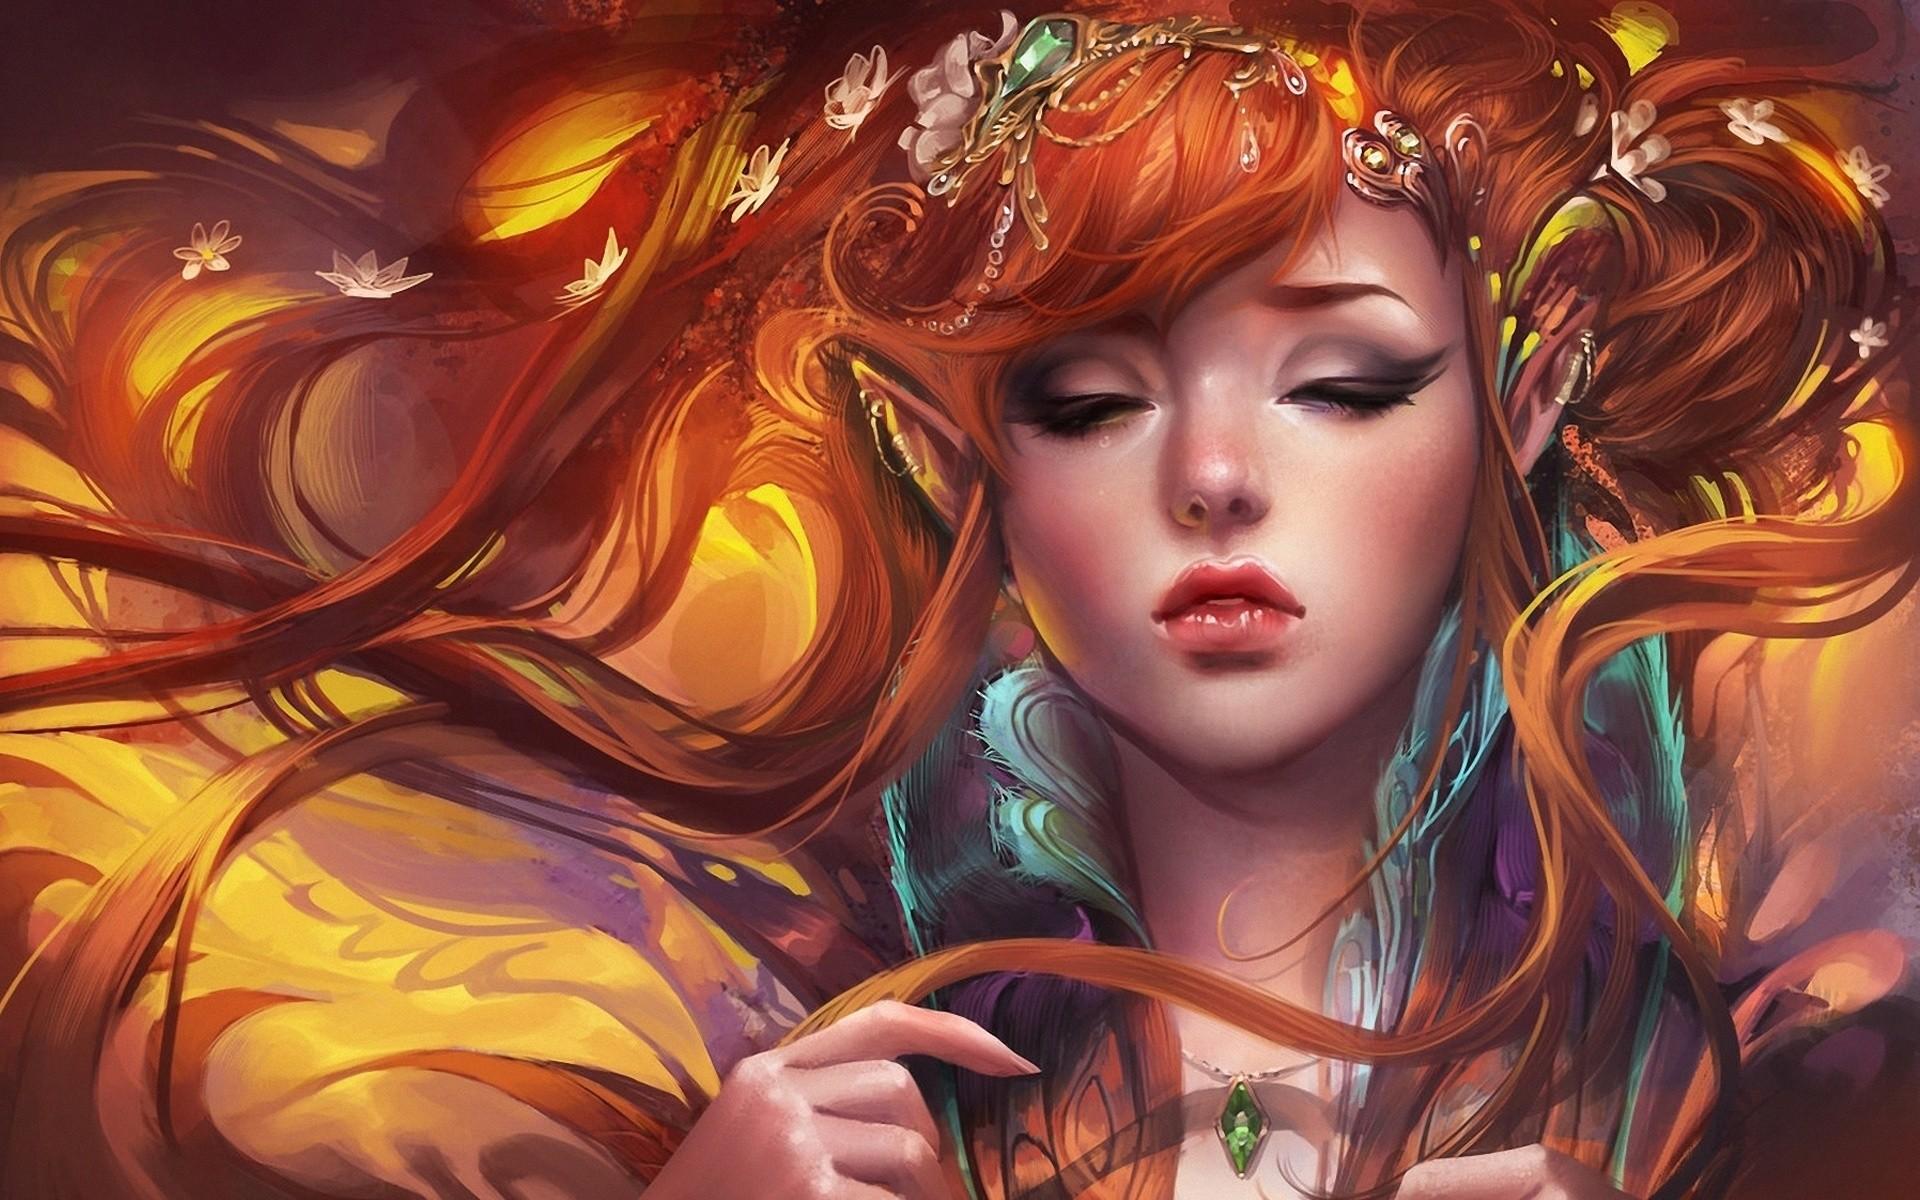 Fantasy – Elf Long Hair Pointed Ears Red Hair Fantasy Woman Girl Wallpaper